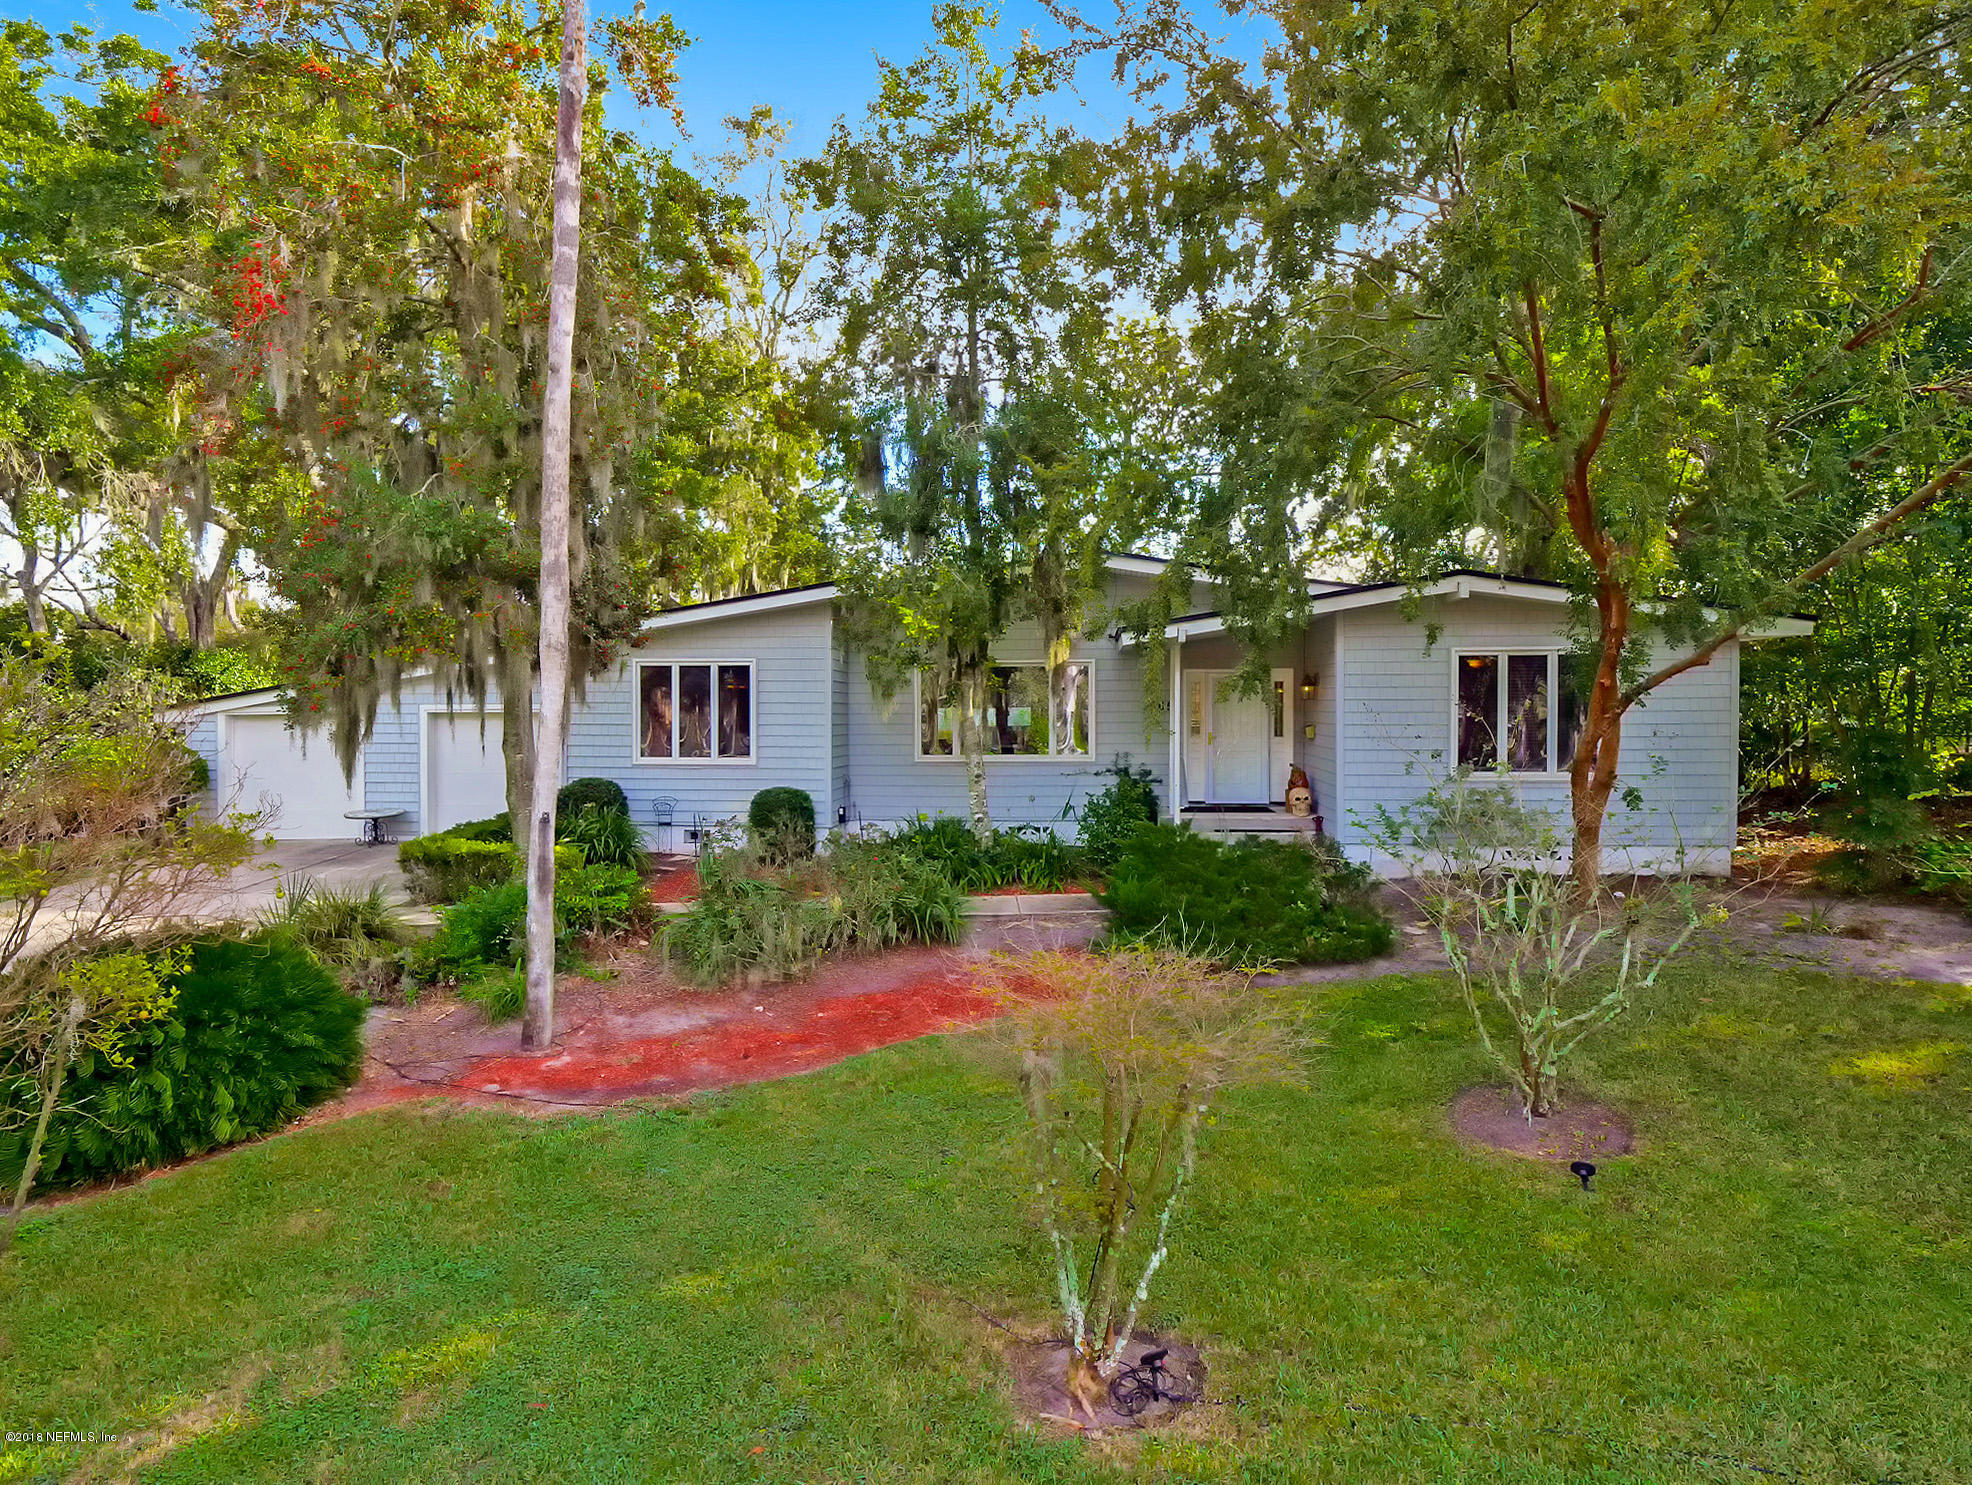 1565 SELVA MARINA, ATLANTIC BEACH, FLORIDA 32233, 3 Bedrooms Bedrooms, ,2 BathroomsBathrooms,Residential - single family,For sale,SELVA MARINA,970598